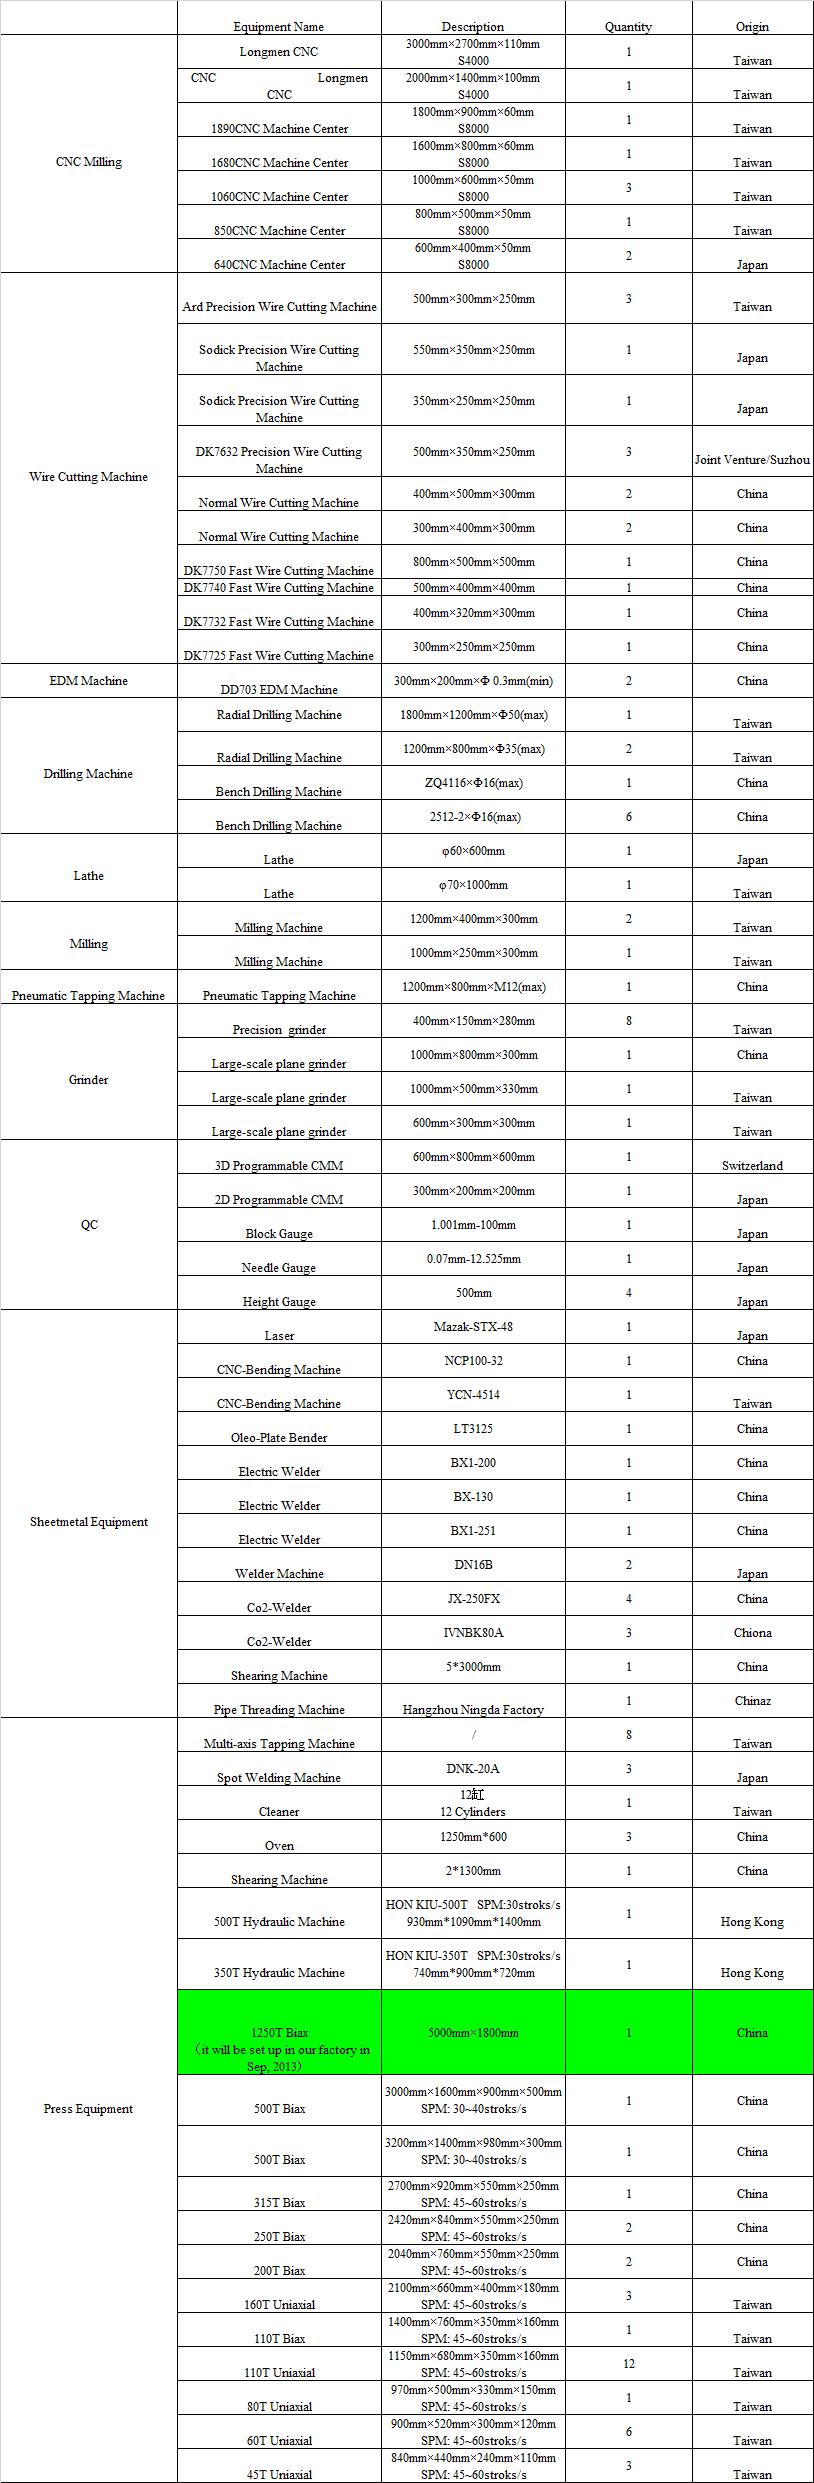 Stamping Die Equipment List